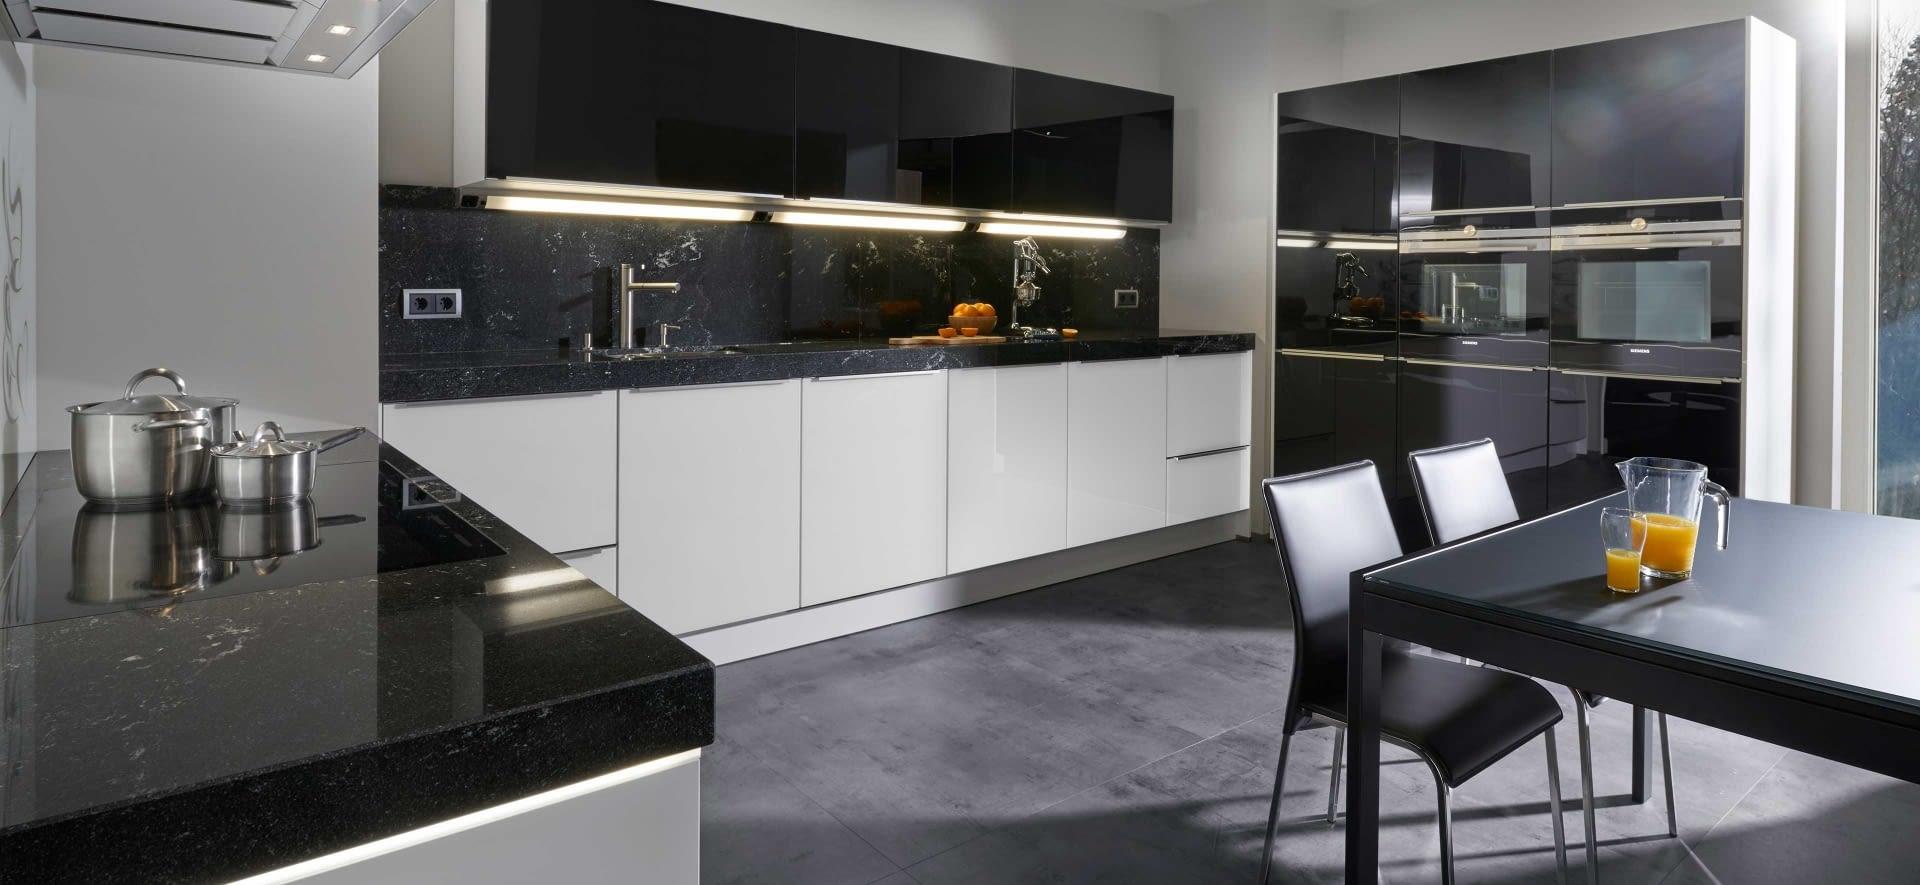 moderne u-küche glas tec plus mit via lattea - marquardt